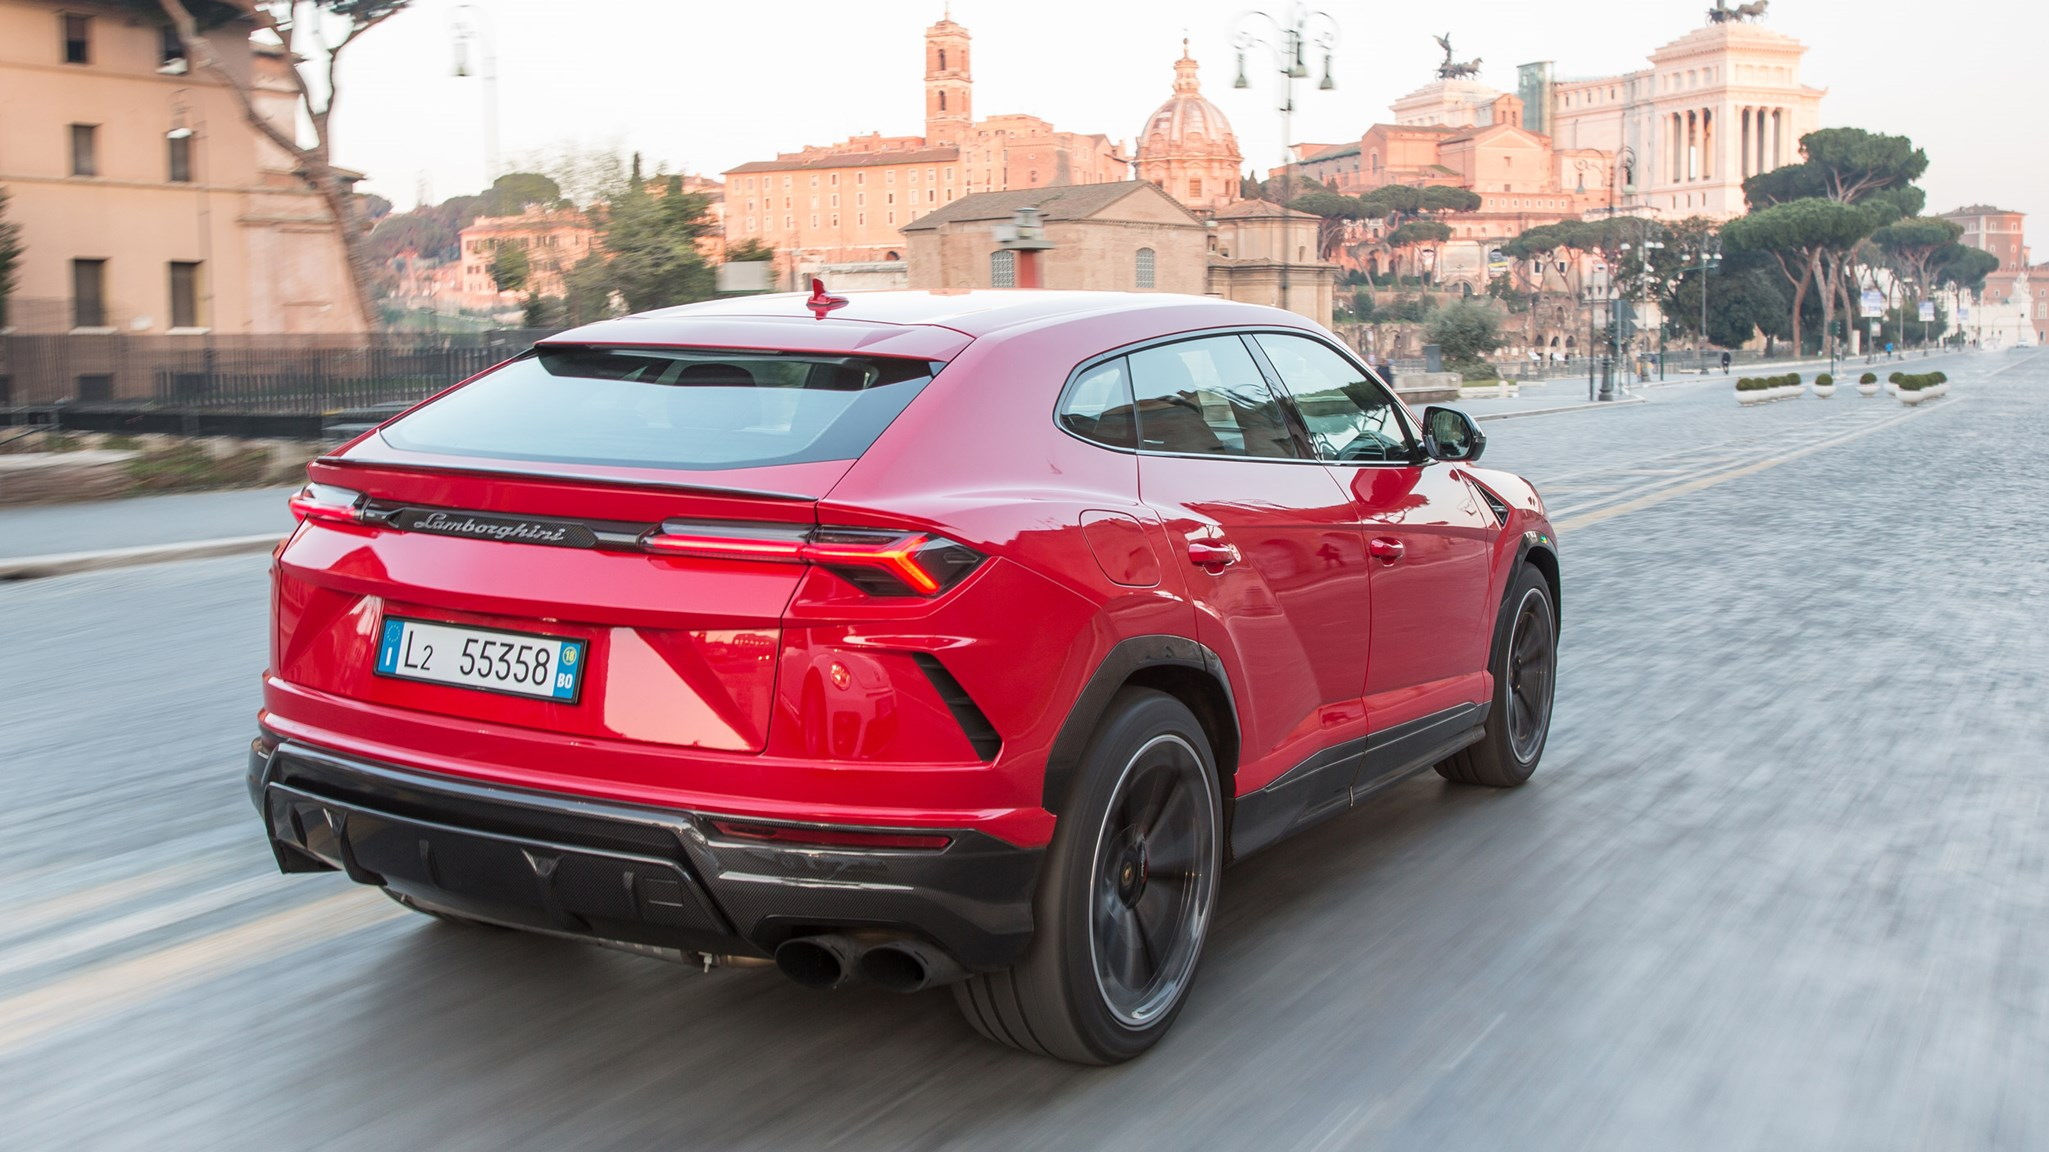 Lamborghini Urus Suv Uk Review Car Magazine